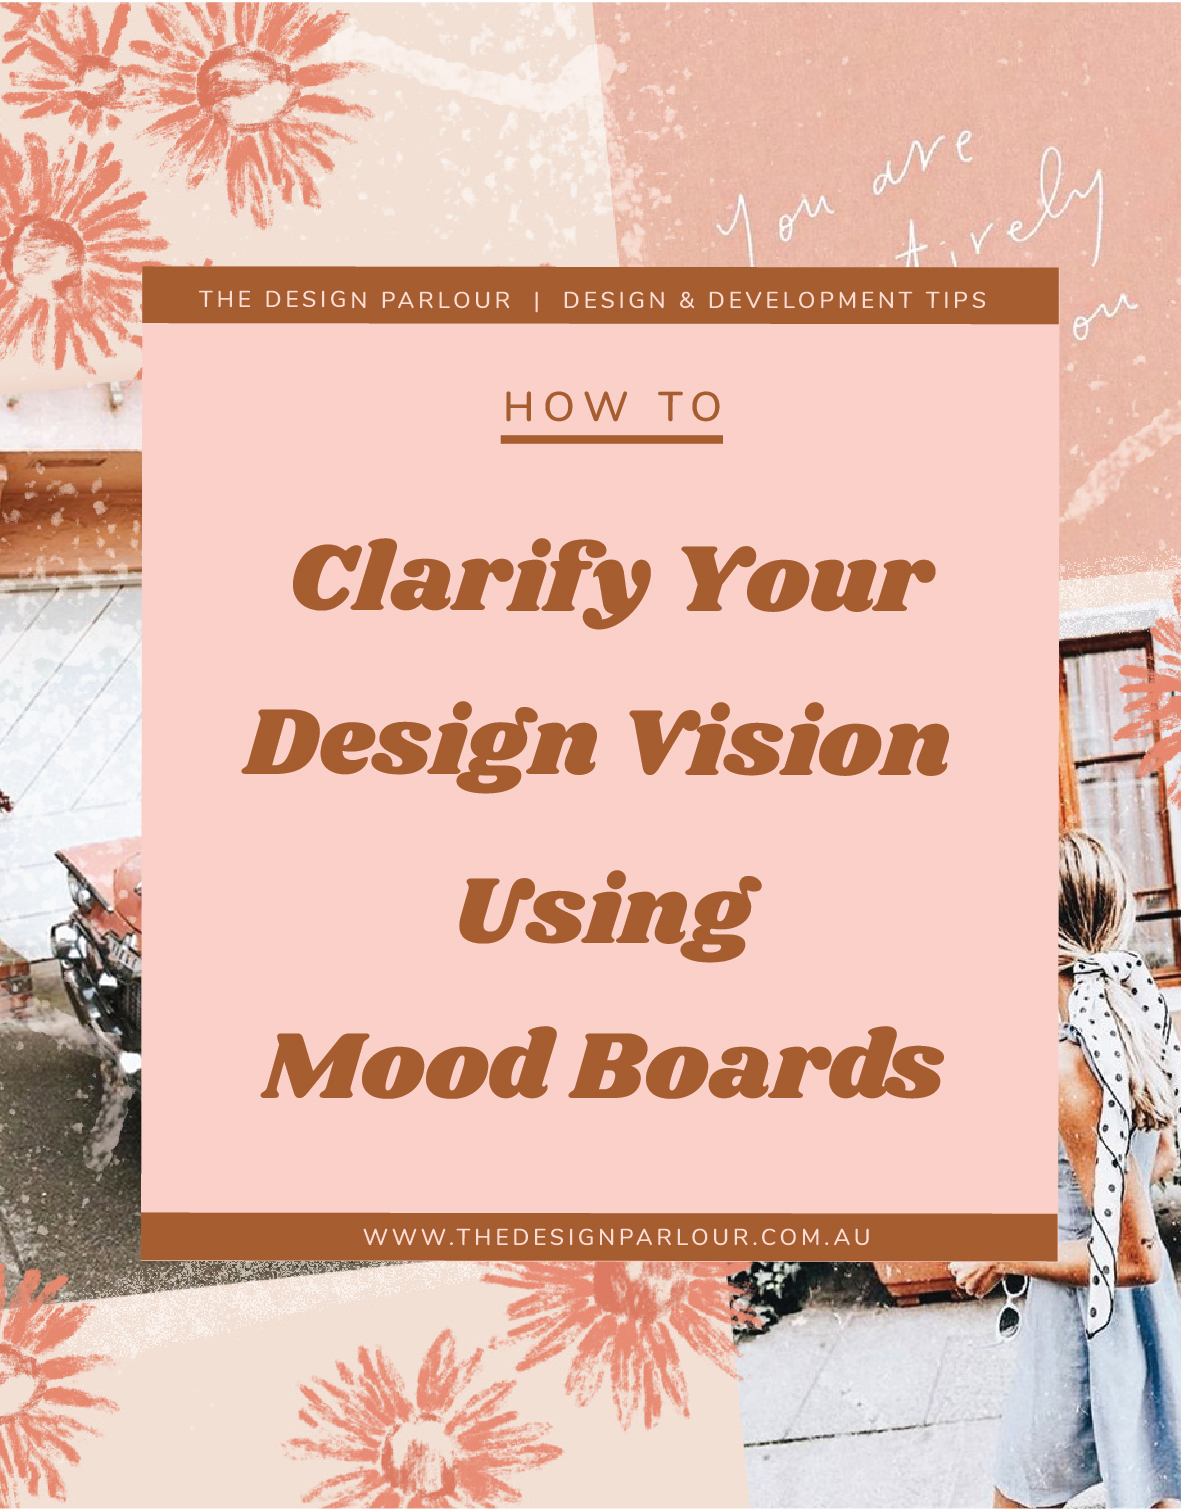 CLARIFY_DESIGN VISION-01.jpg